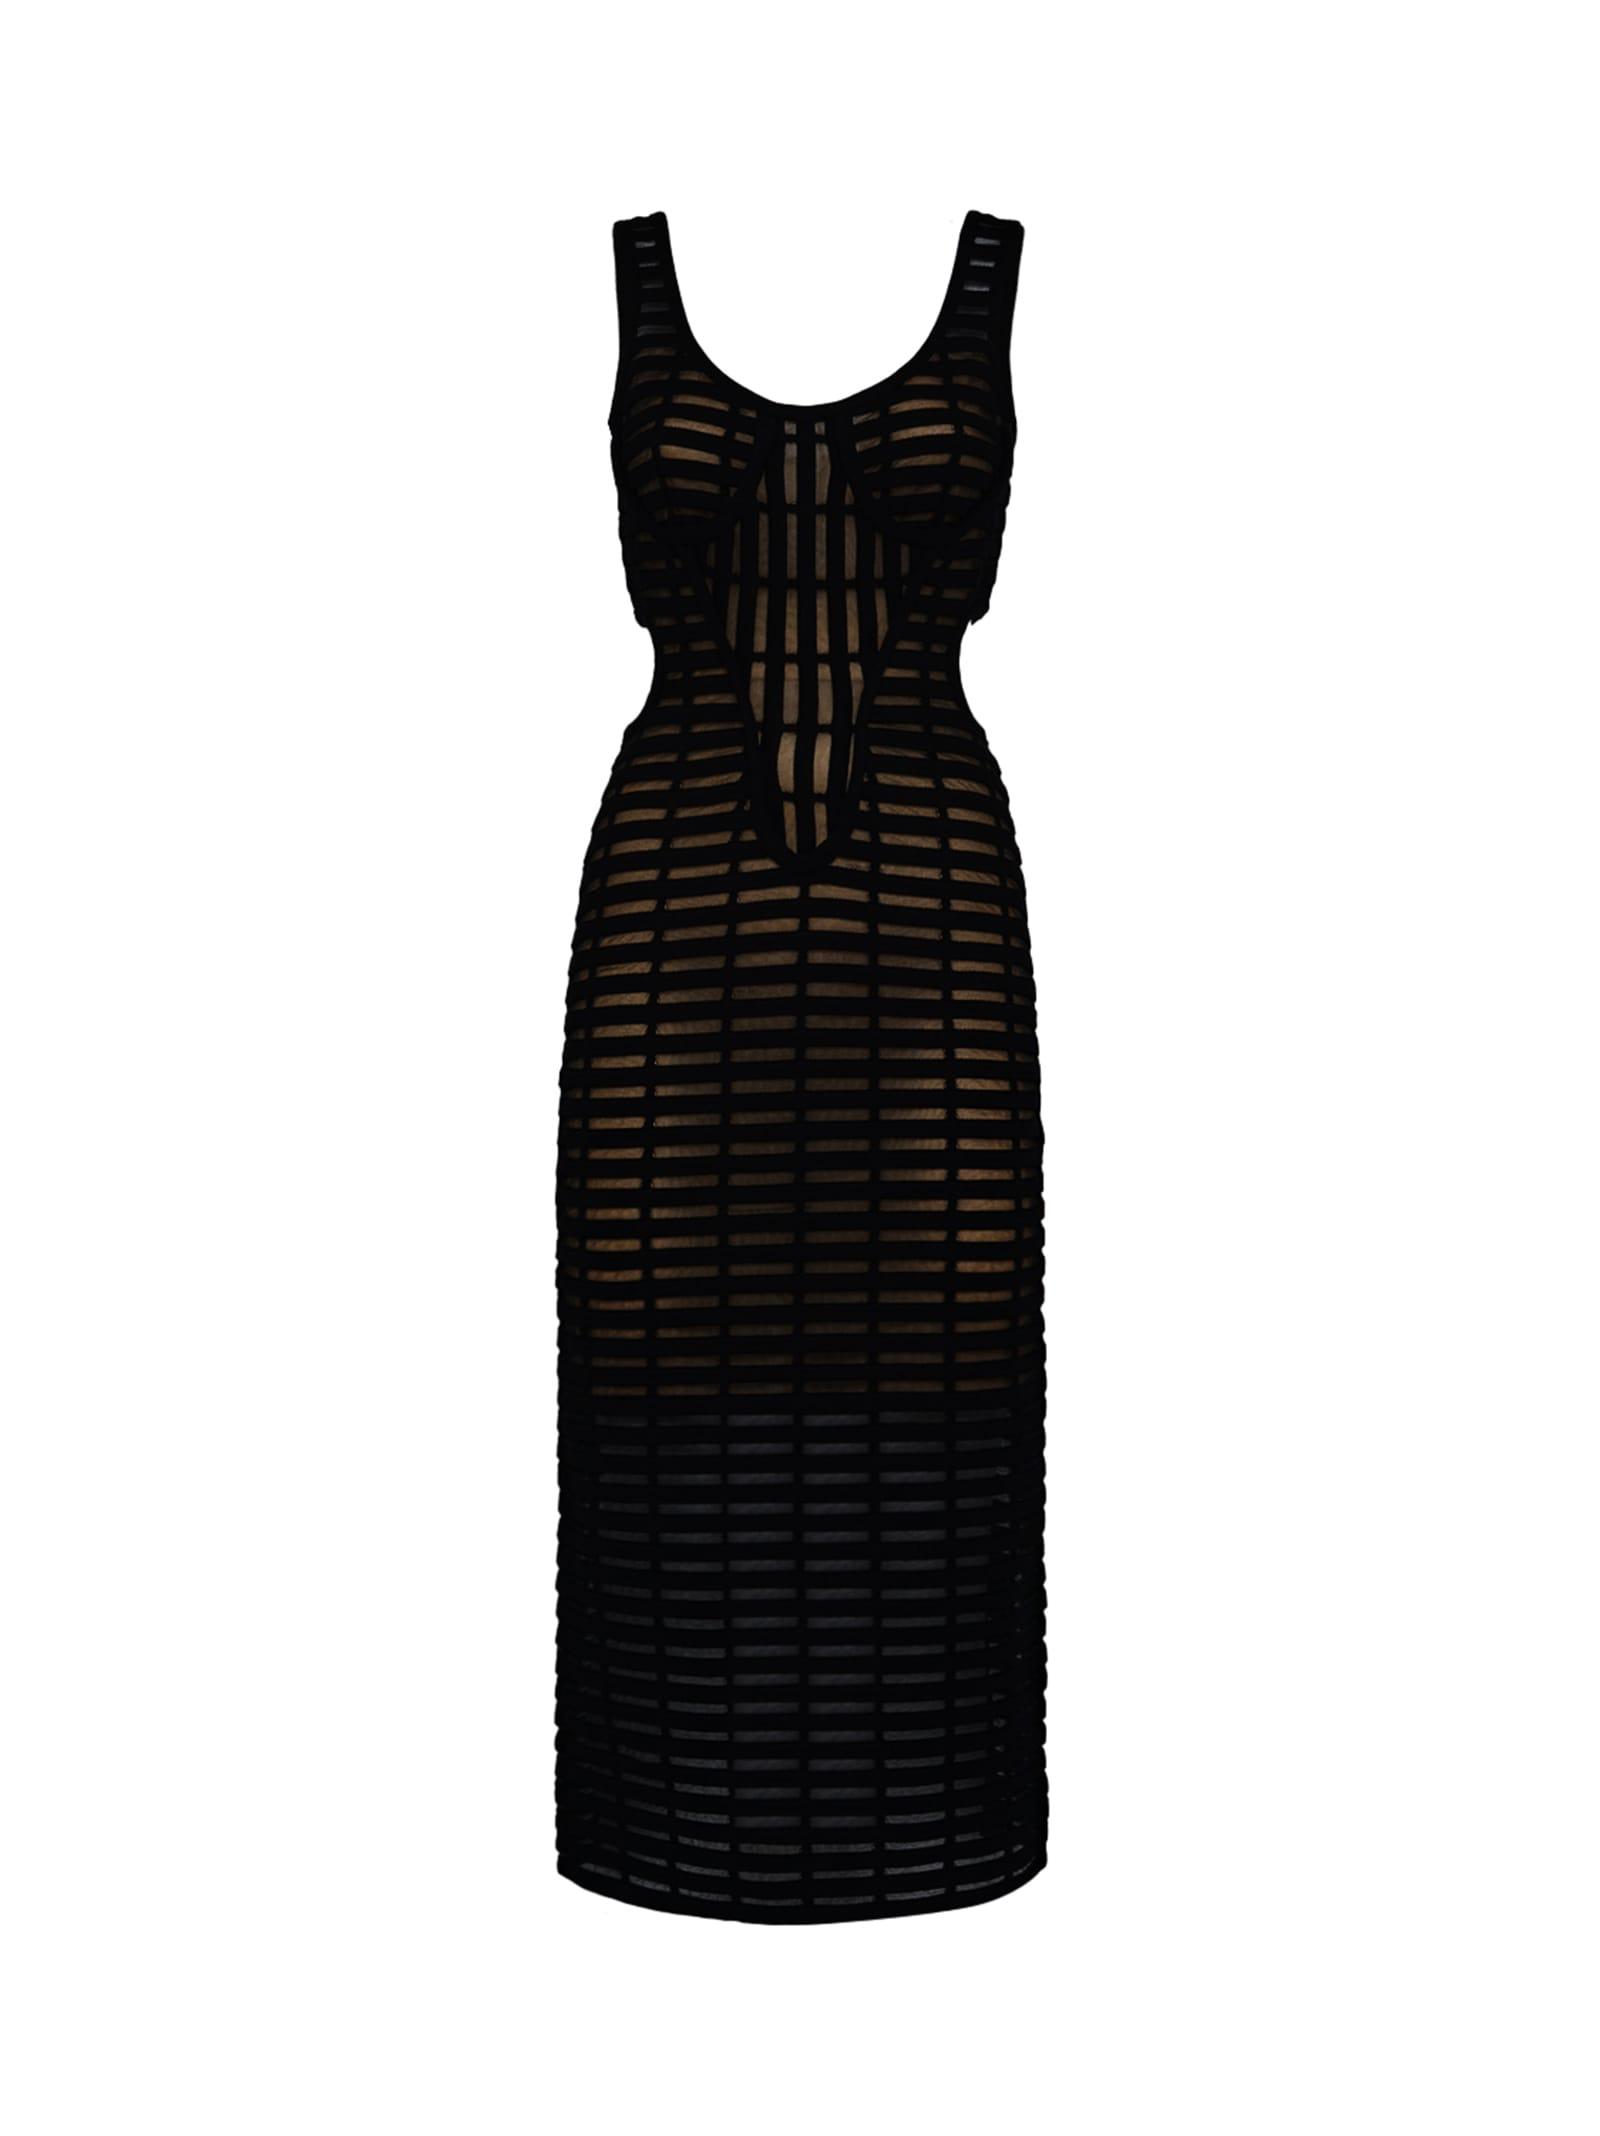 Black Open-knit Bodycon Dress